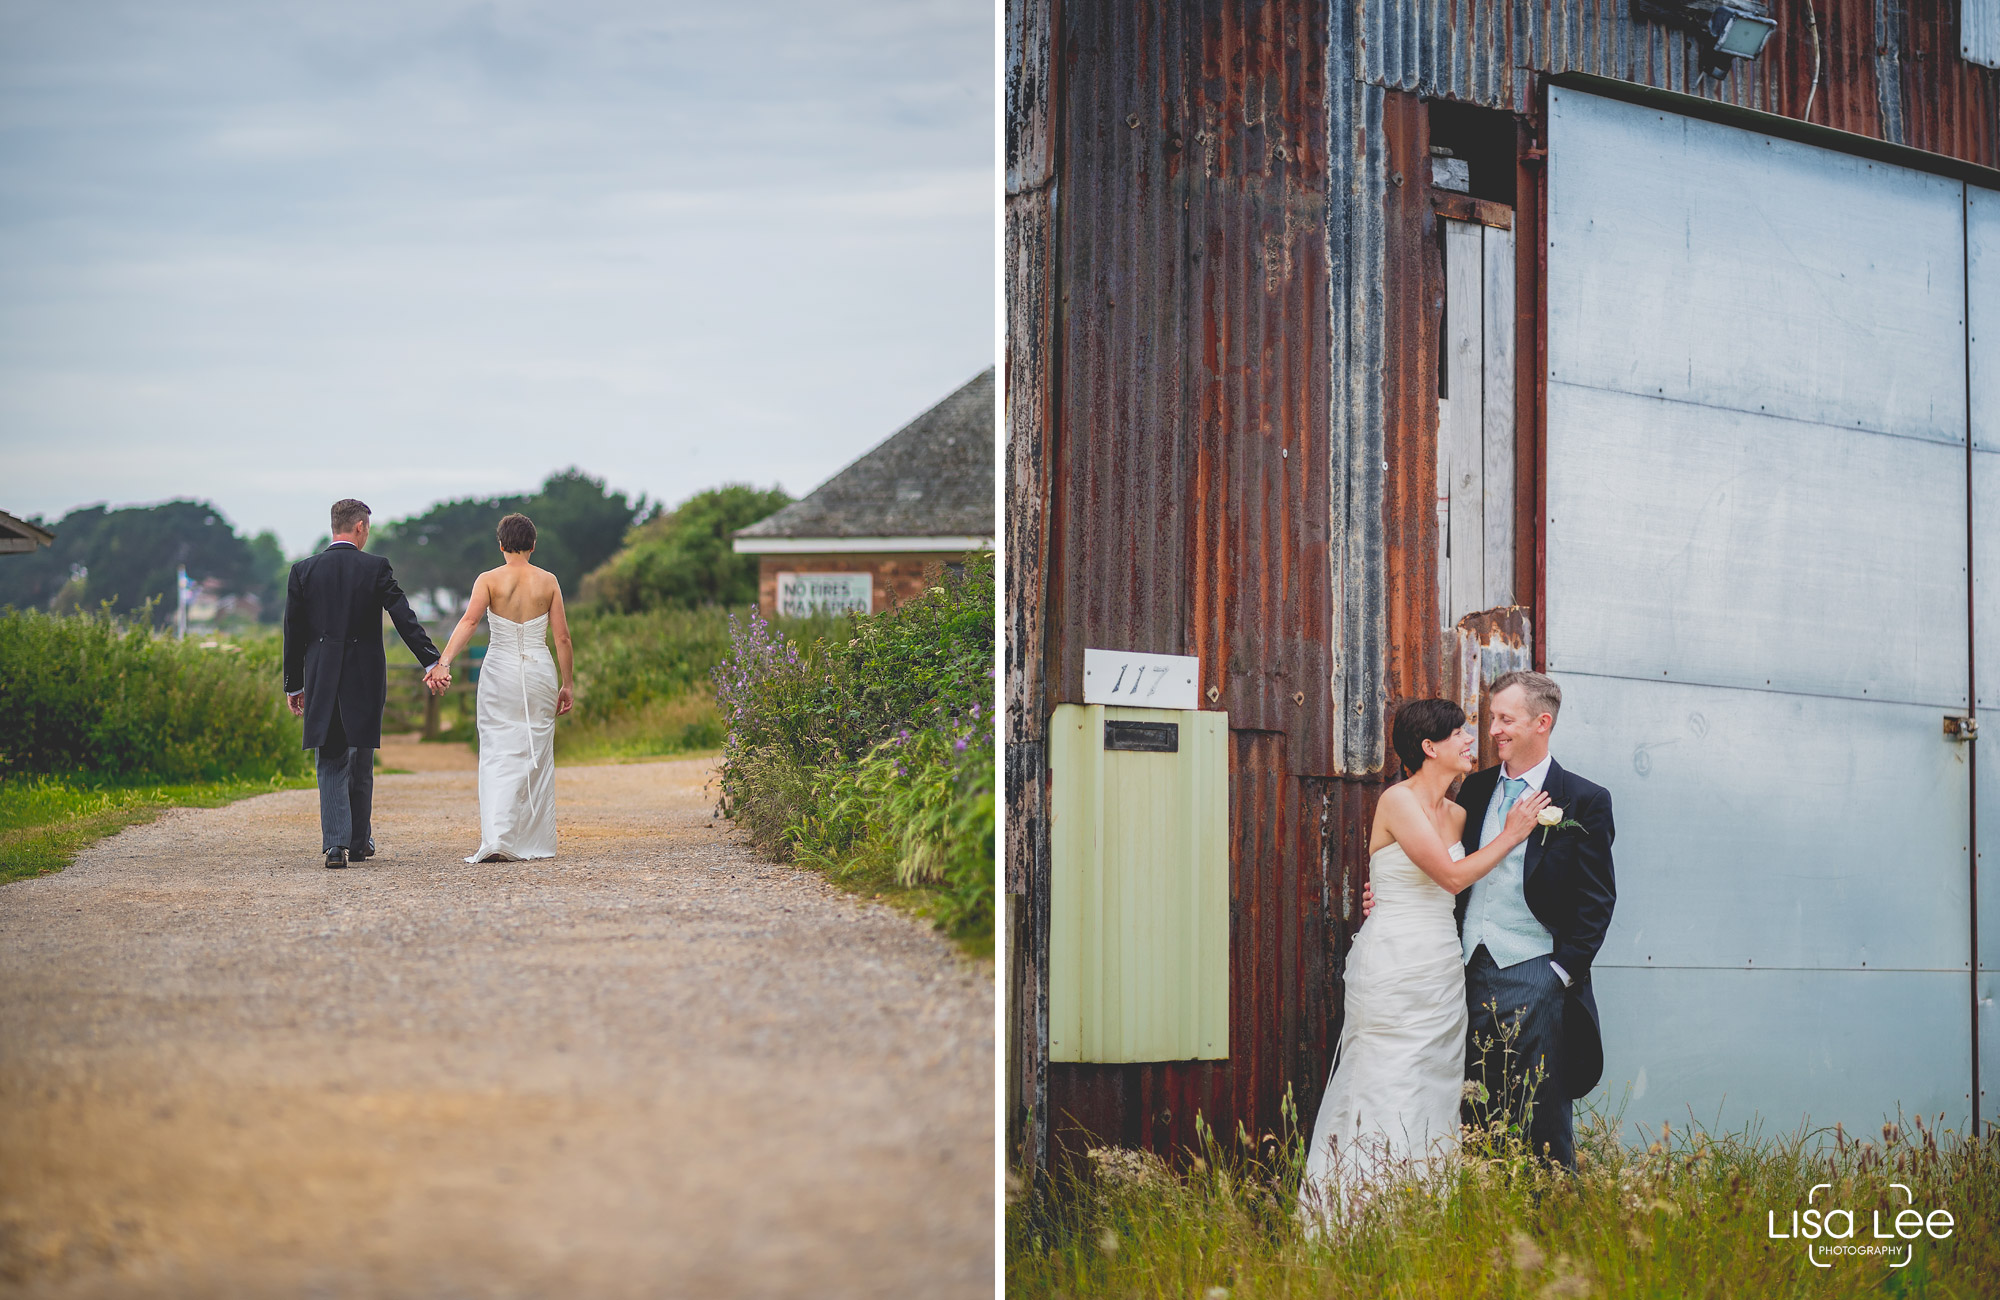 lisa-lee-wedding-photography-burton-walking2.jpg